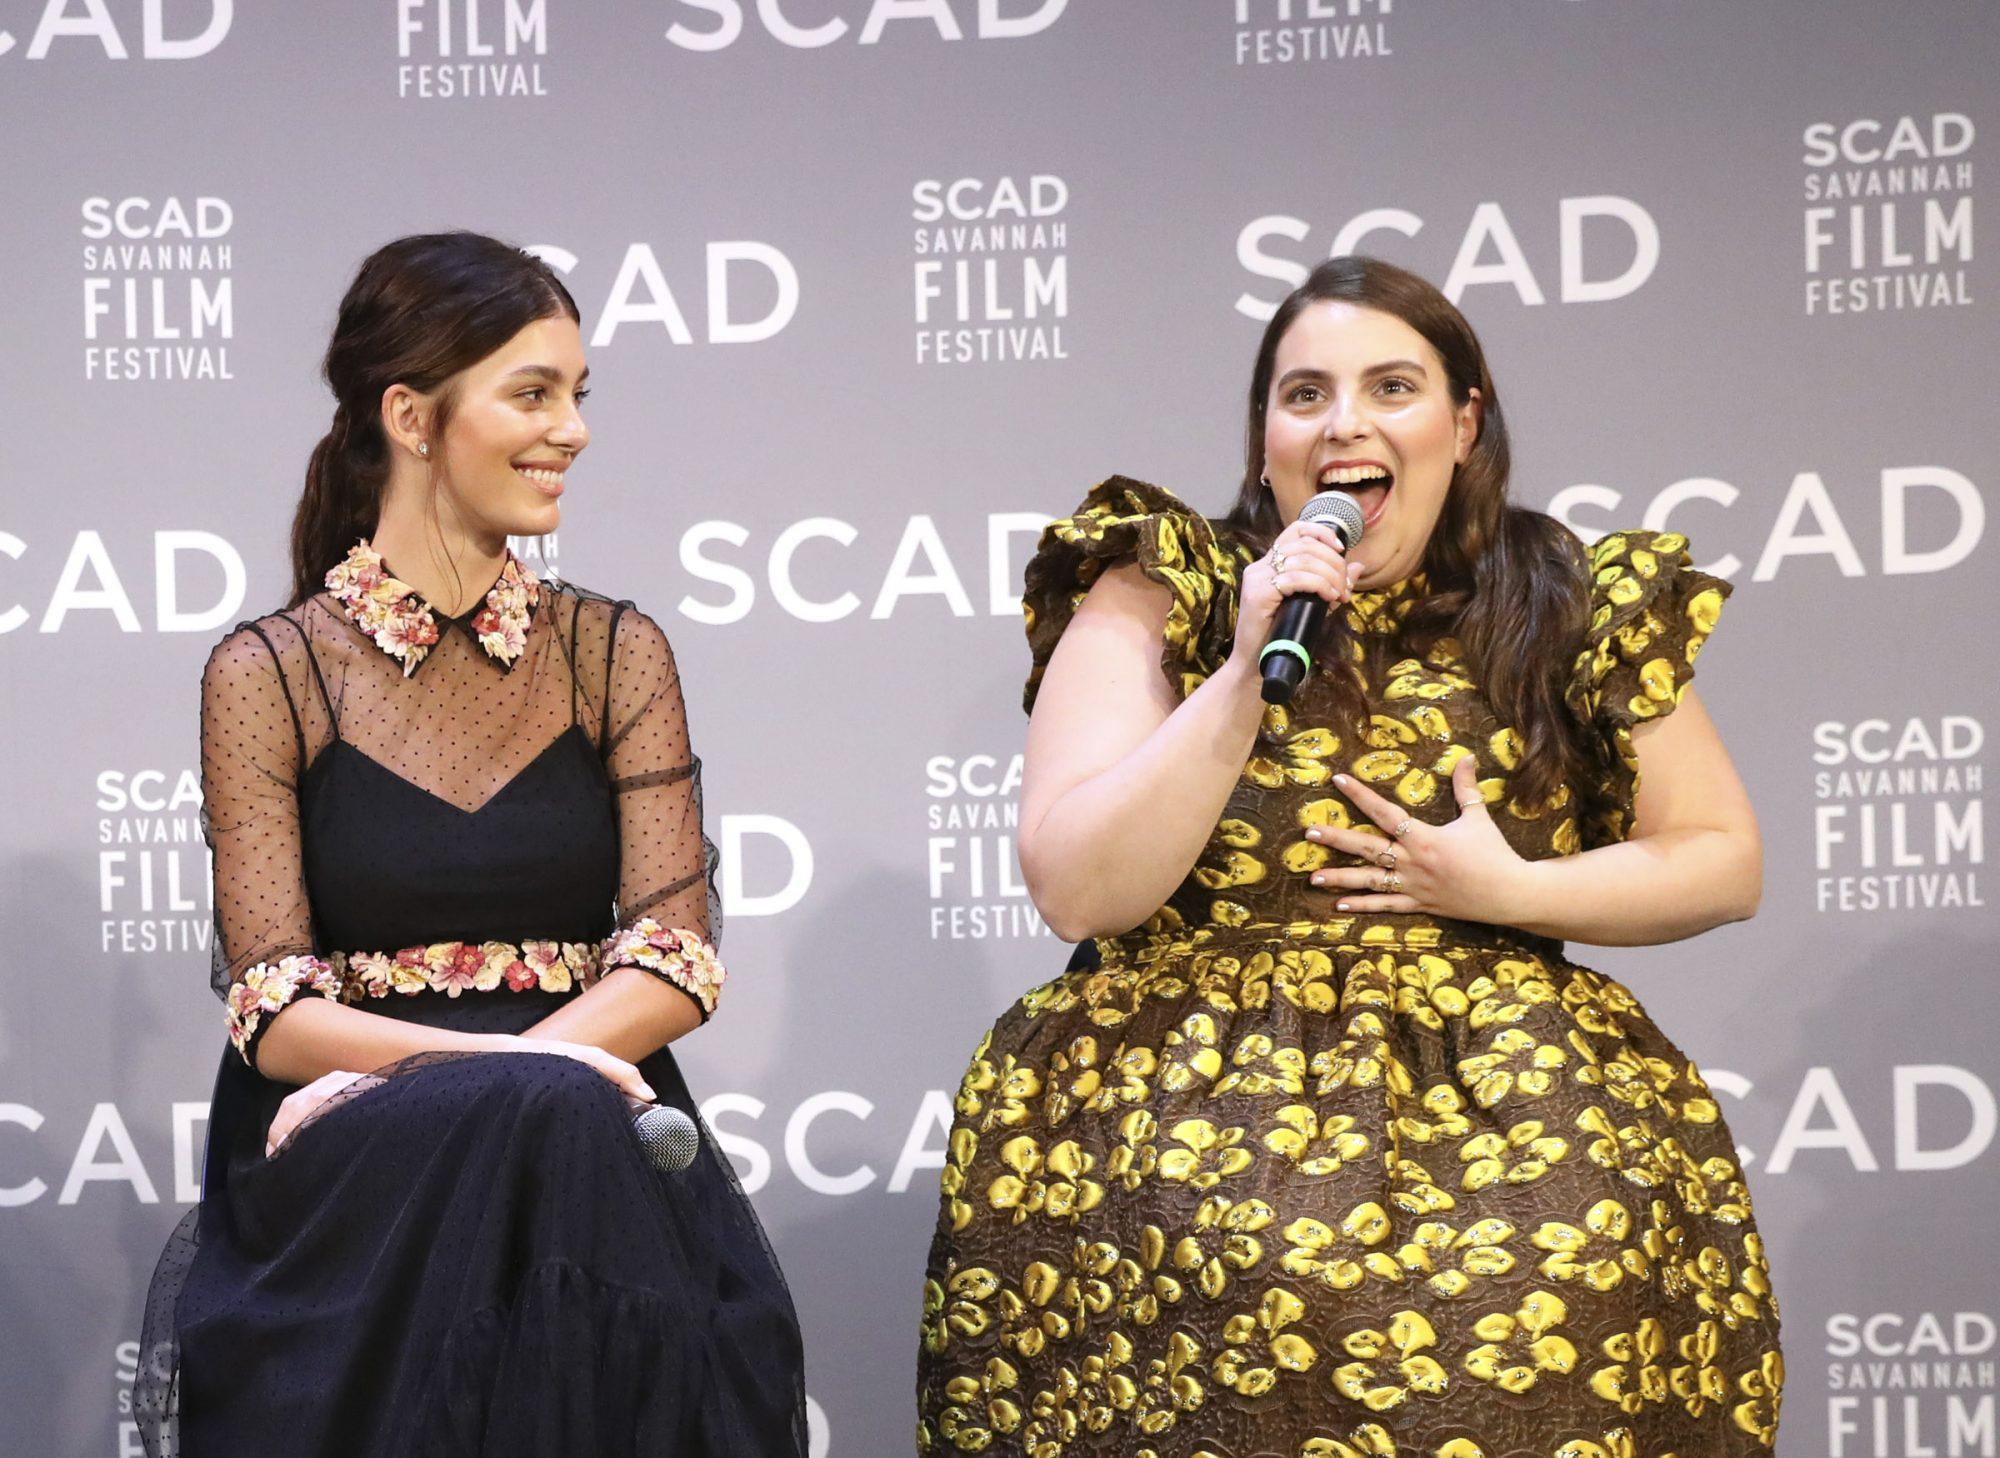 22nd SCAD Savannah Film Festival - Breakout Awards Panel & Awards Presentation To Kaitlyn Dever, Beanie Feldstein, Jharrel Jerome, Mena Massoud, Camila Morrone